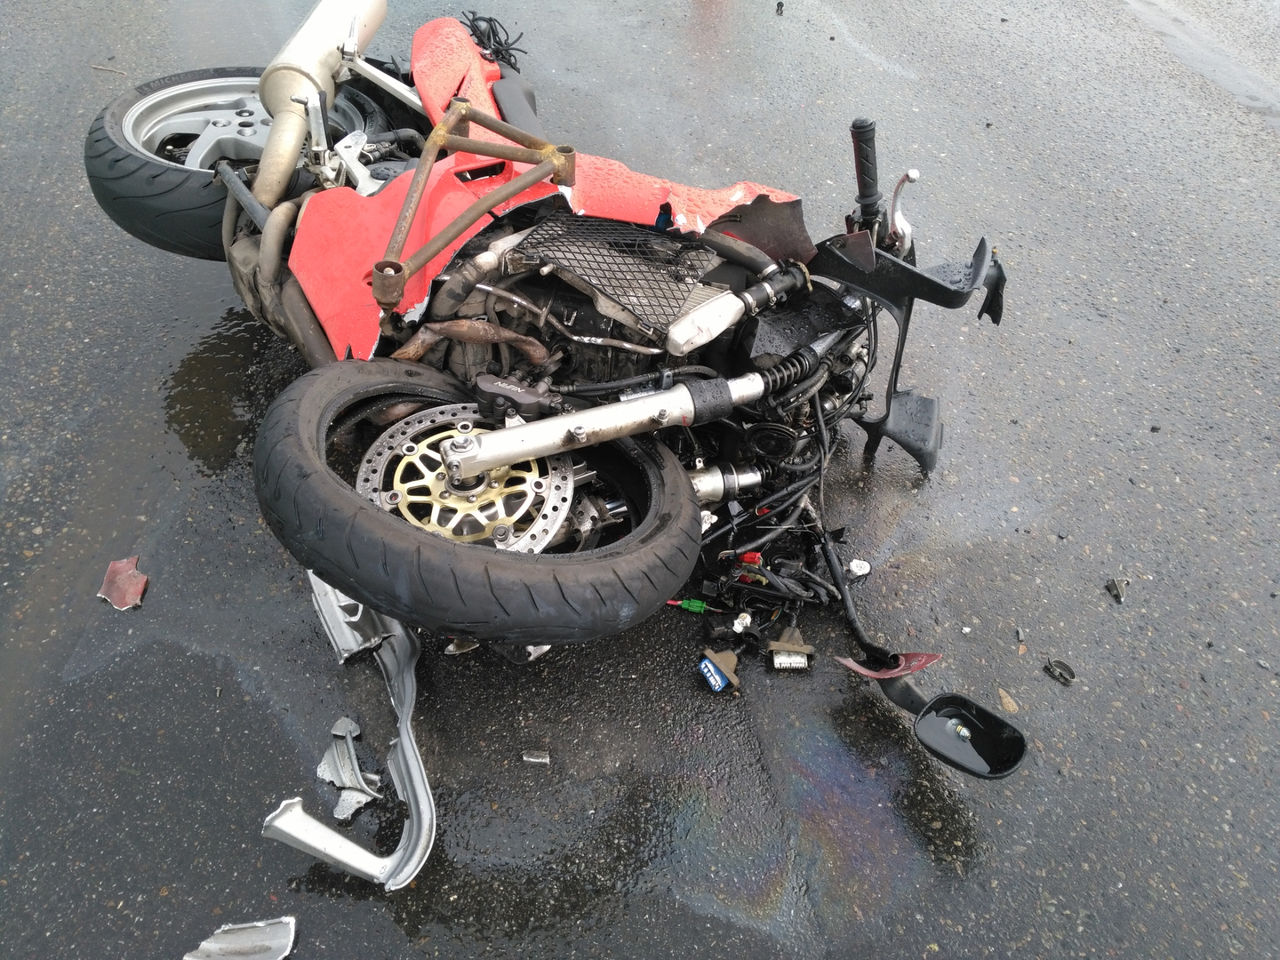 ВКузбассе шофёр «Мазды» насмерть сбил мотоциклистку ипопал под суд